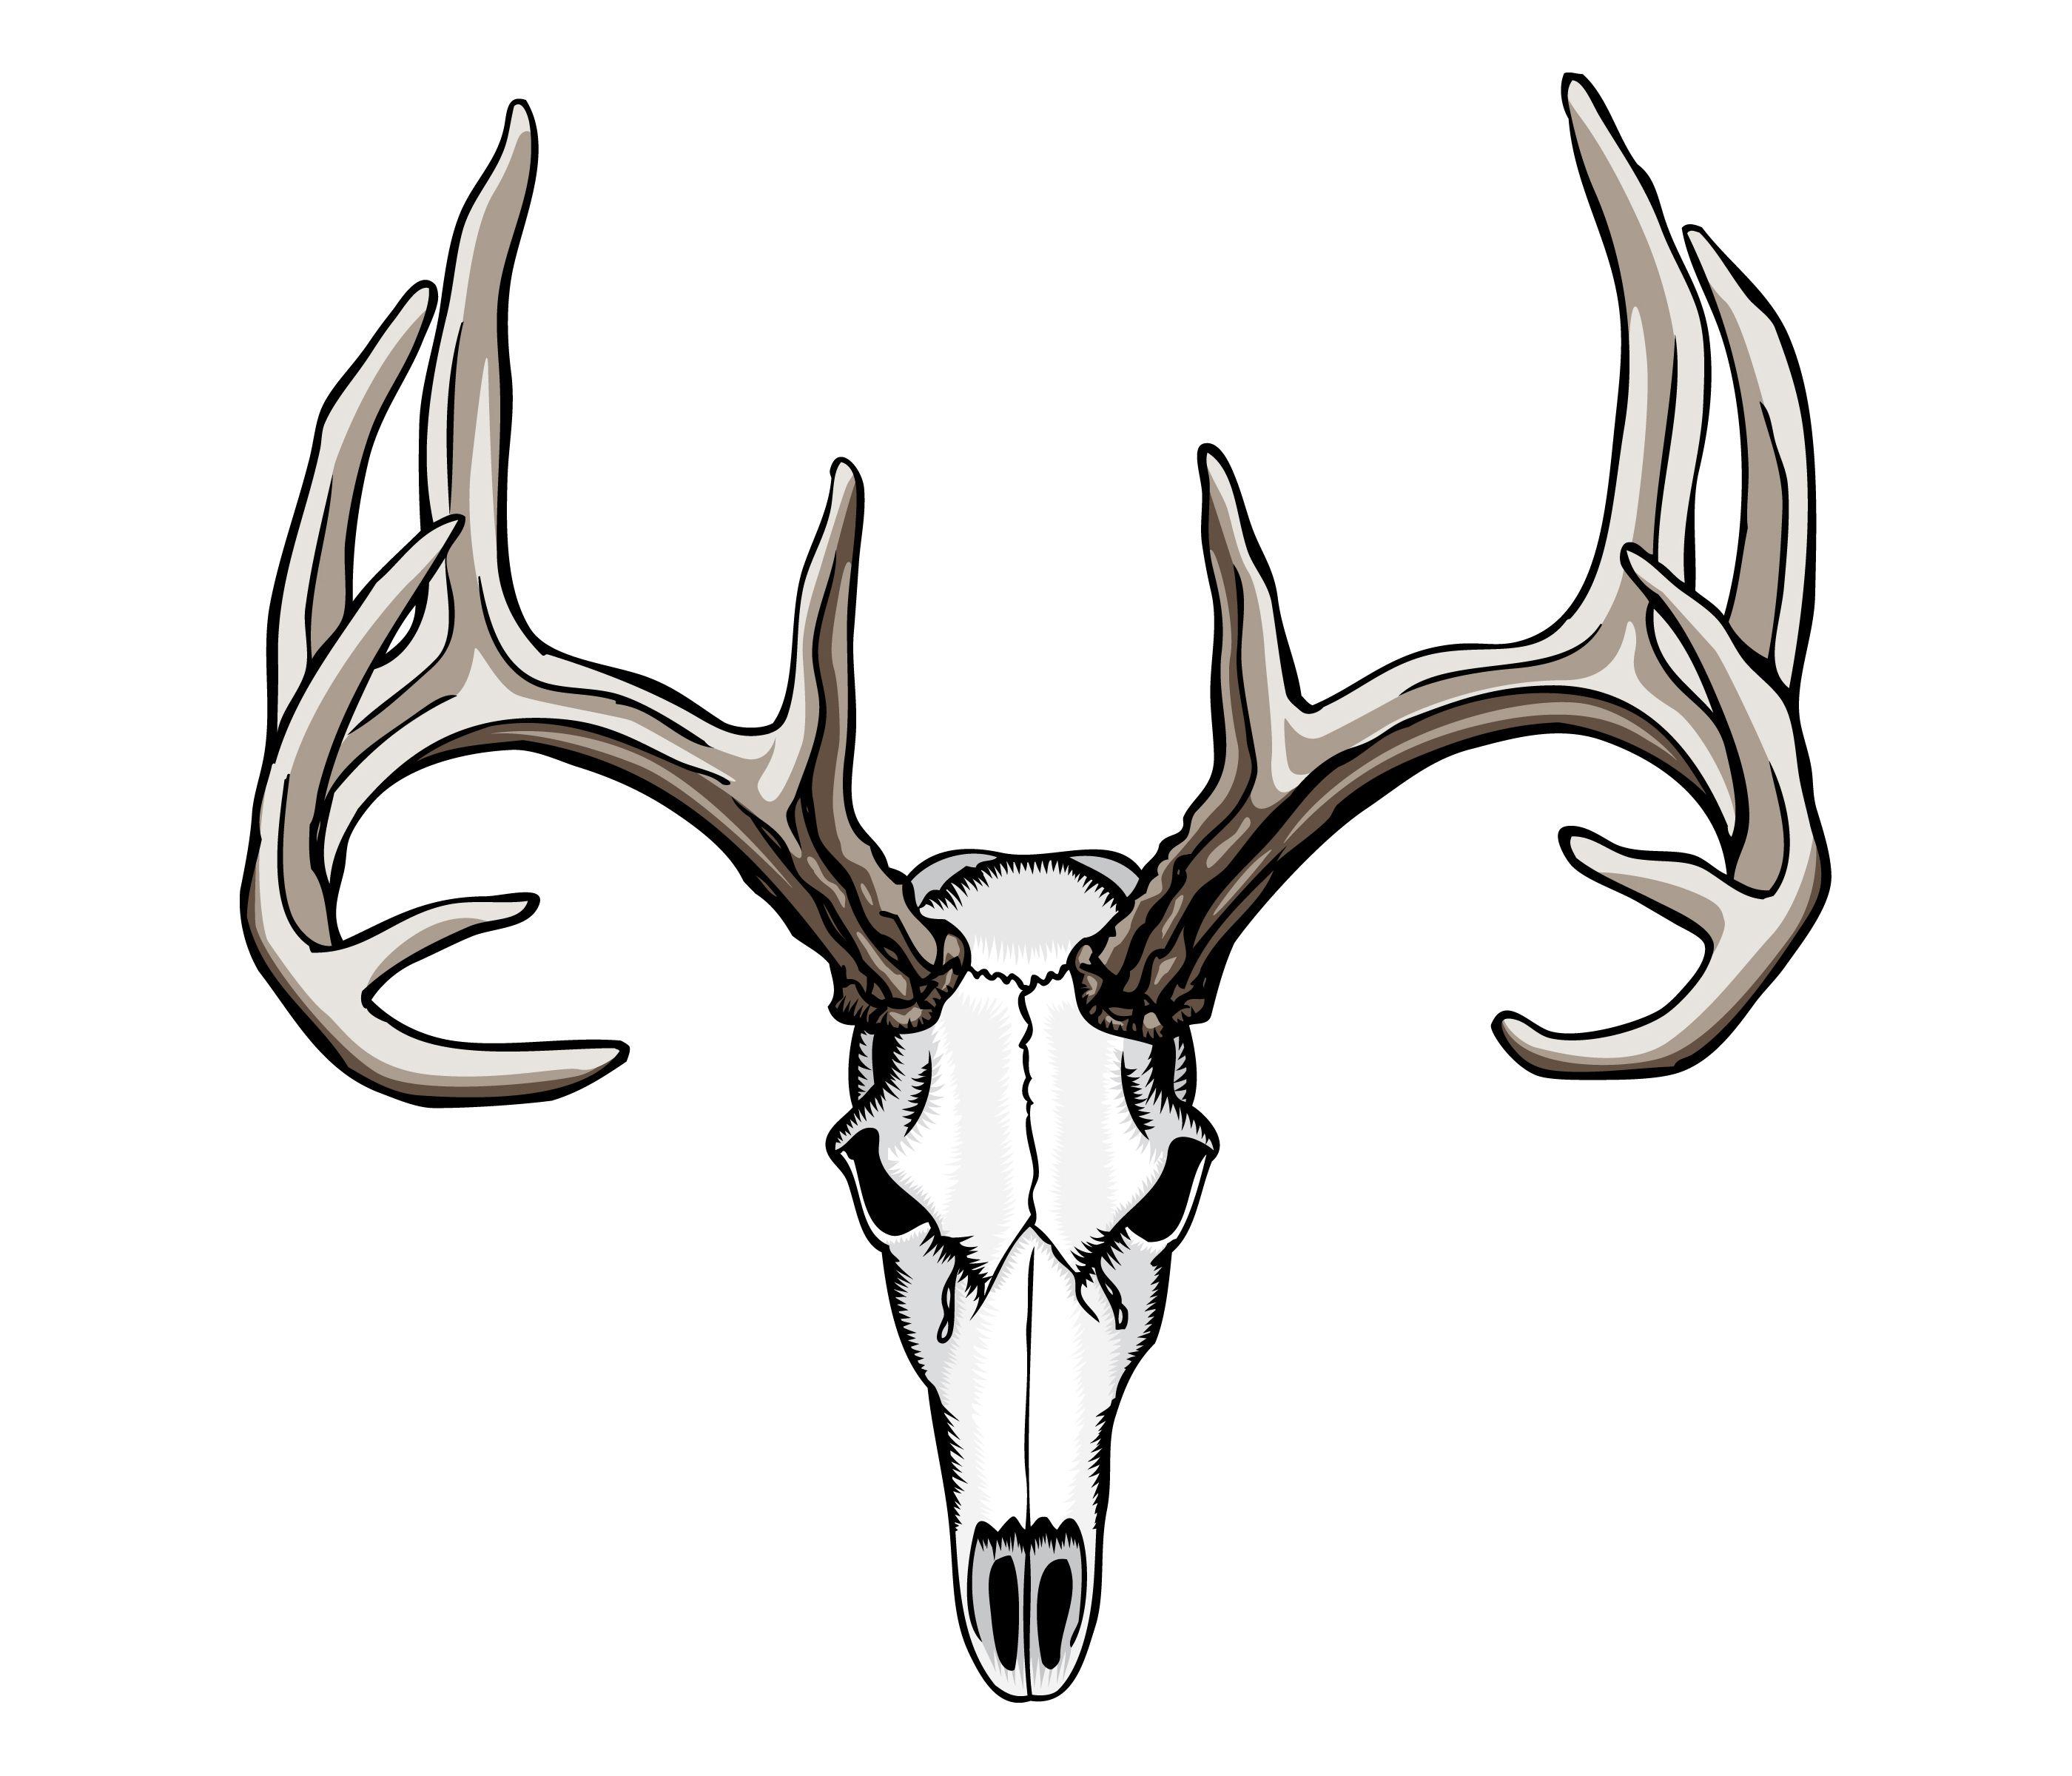 Antler clipart sketch. Whitetail deer skull tattoos